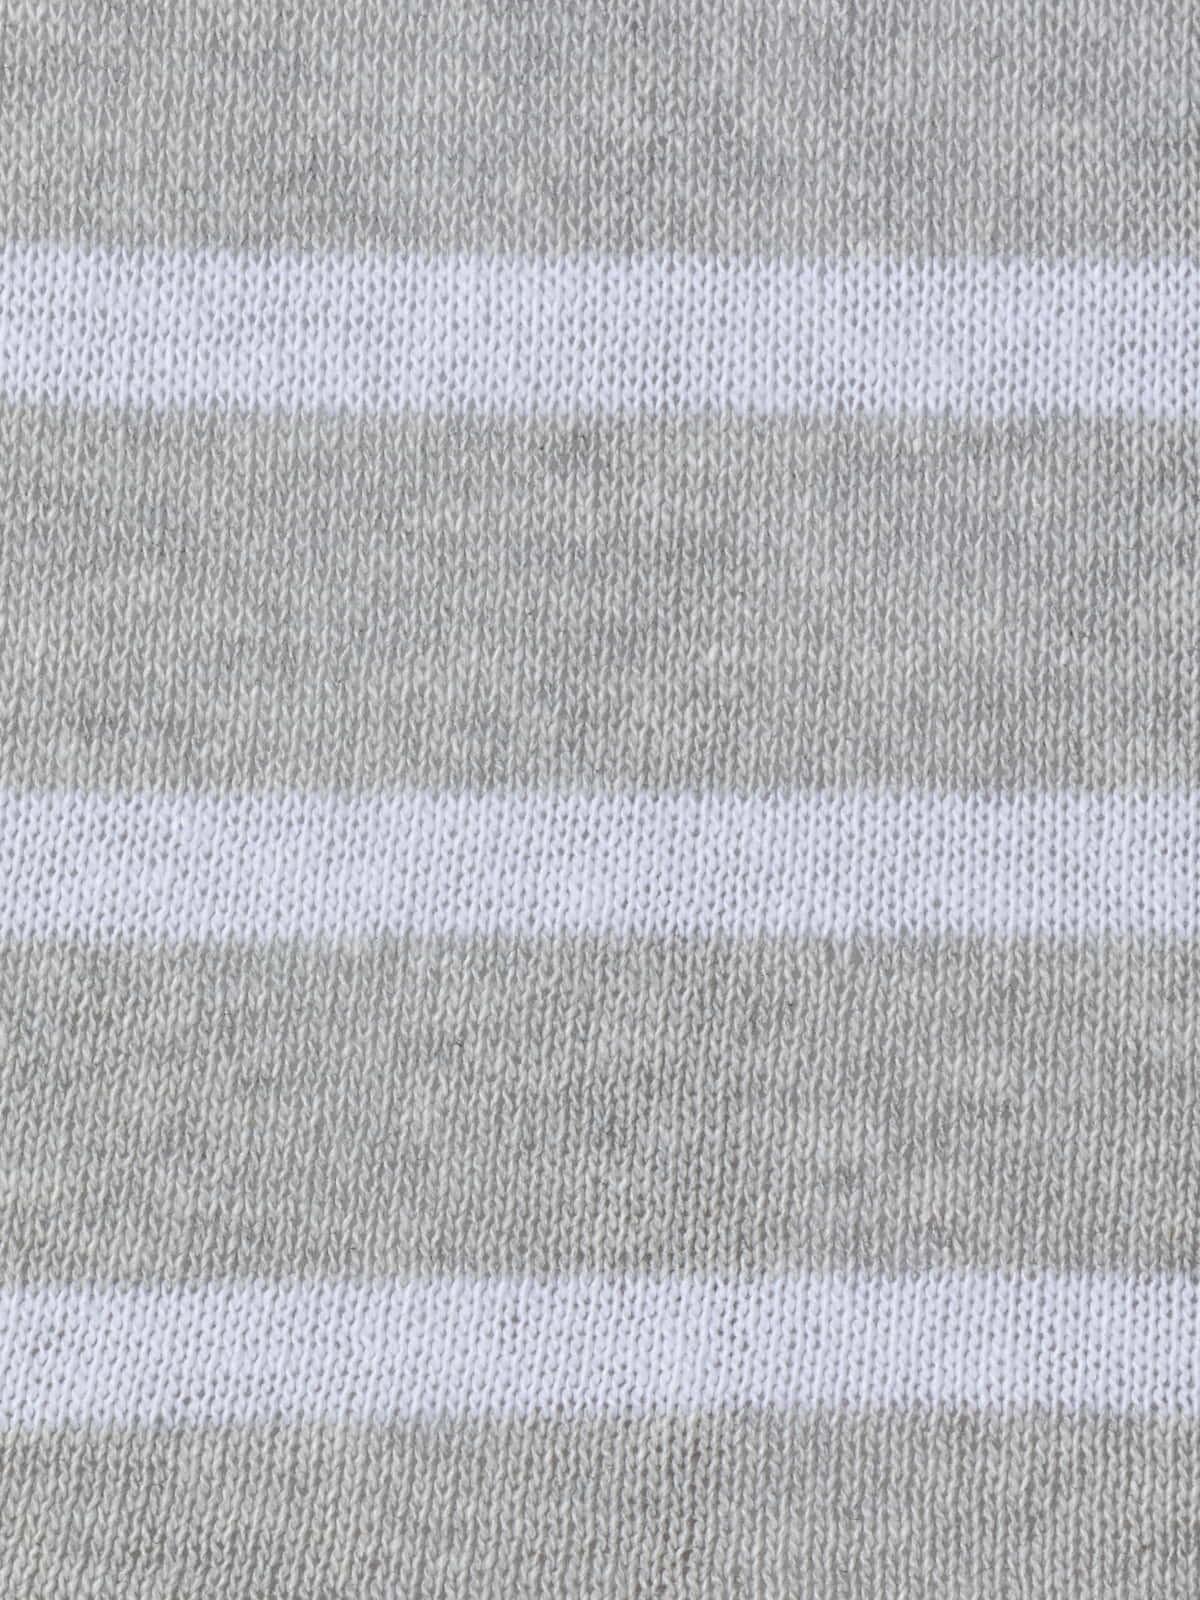 Jersey rayas mujer algodón Gris